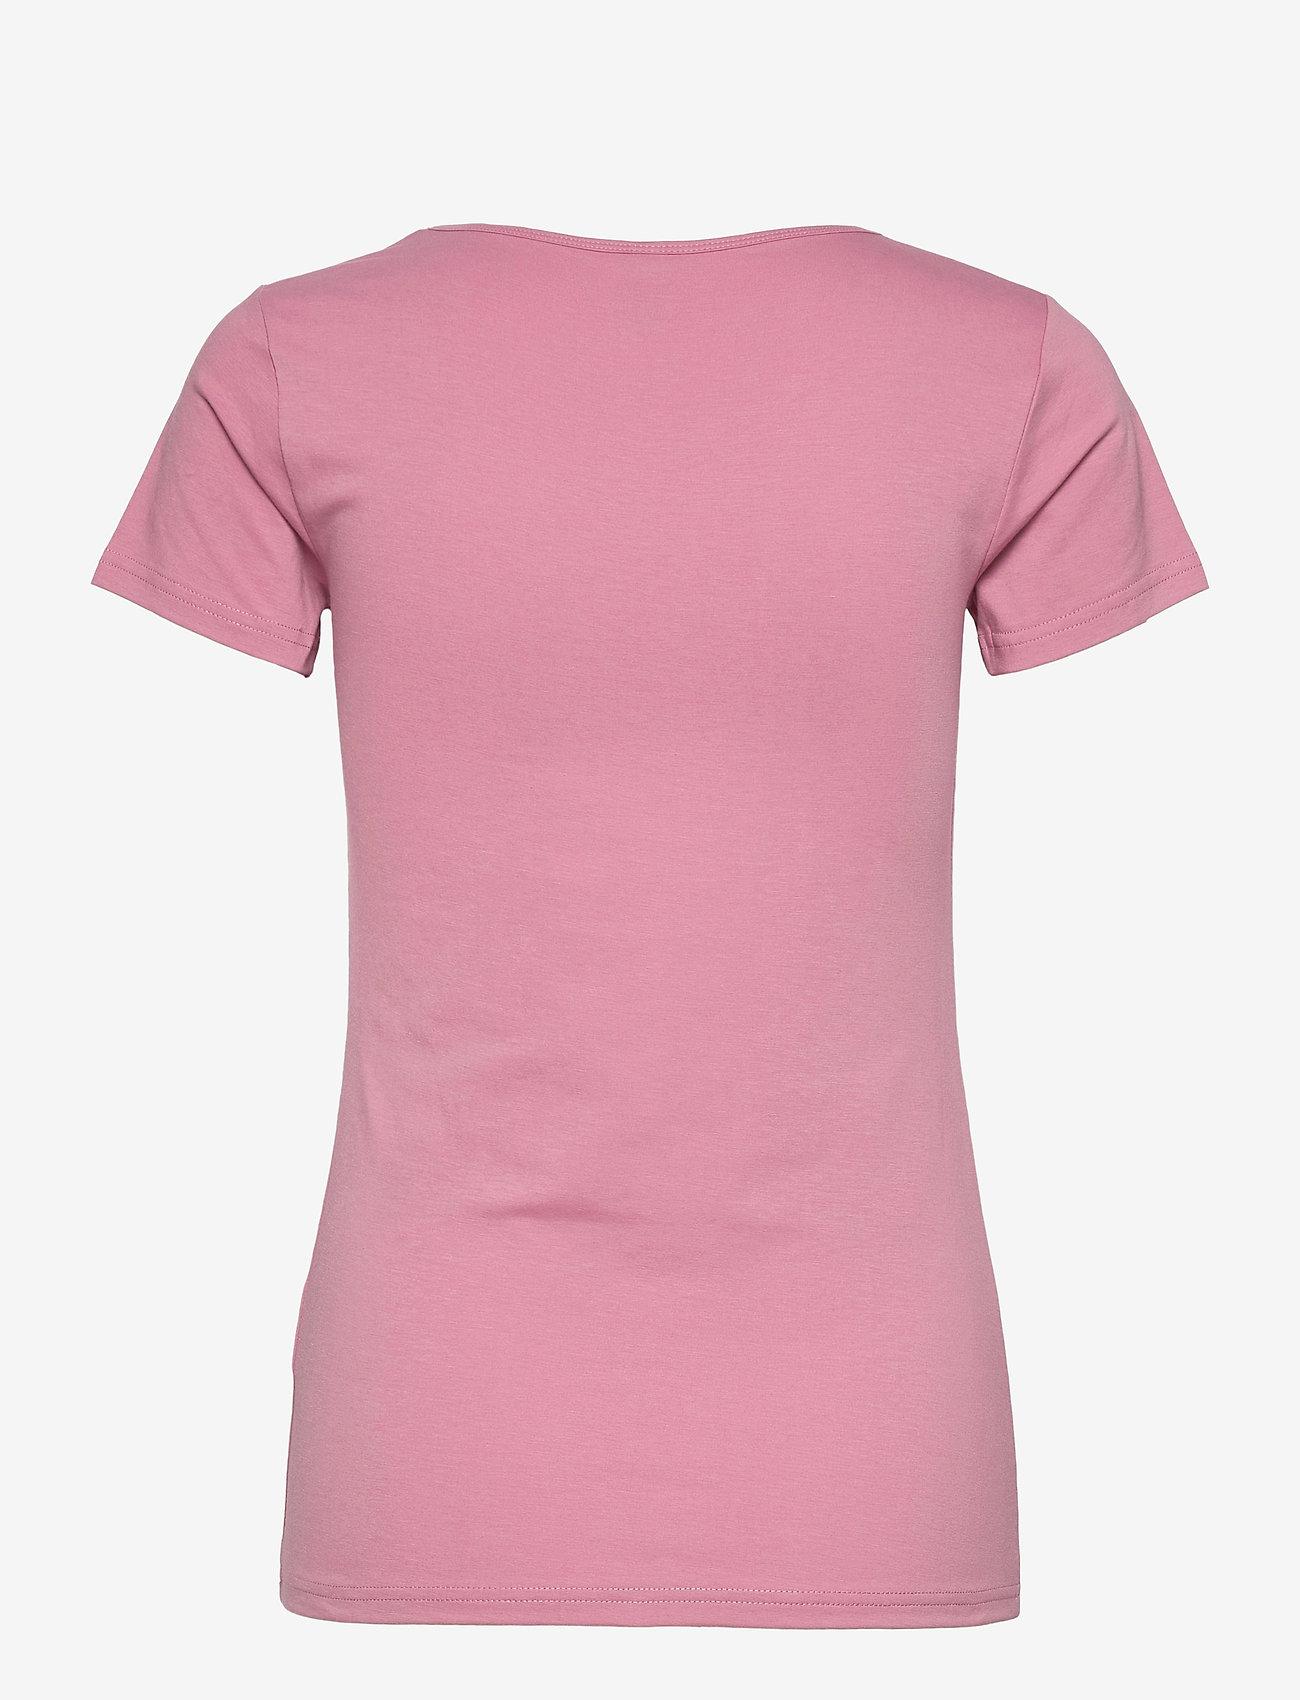 Soyaconcept - SC-PYLLE - t-shirt & tops - pink rose - 1